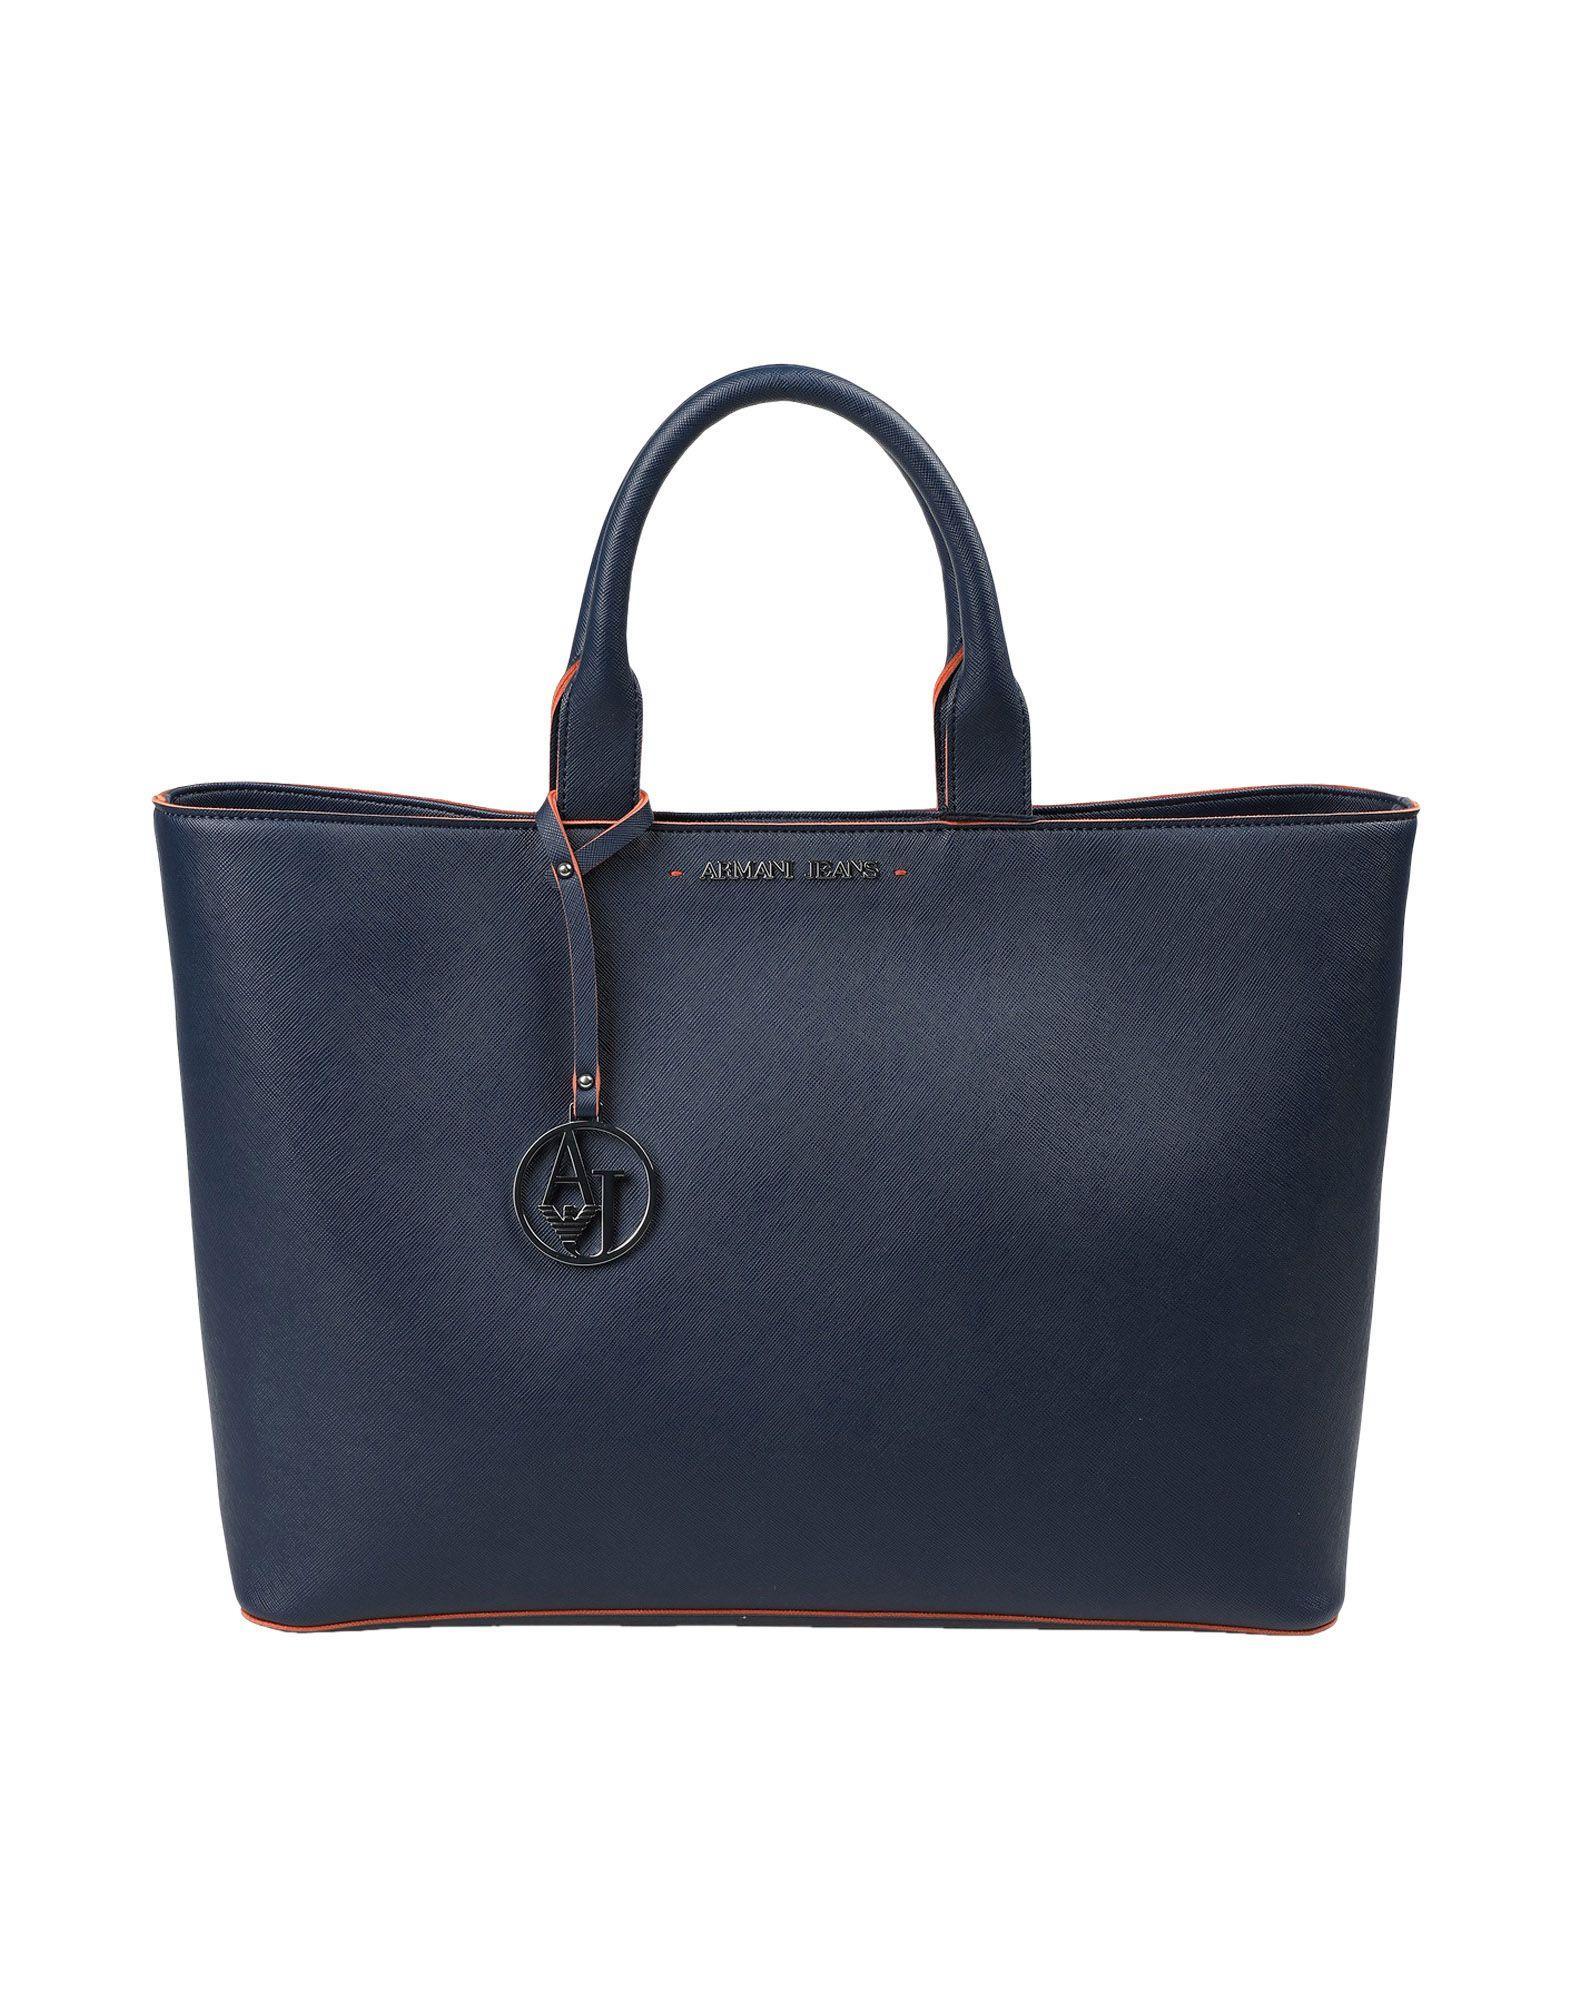 Armani Jeans Handbag In Blue